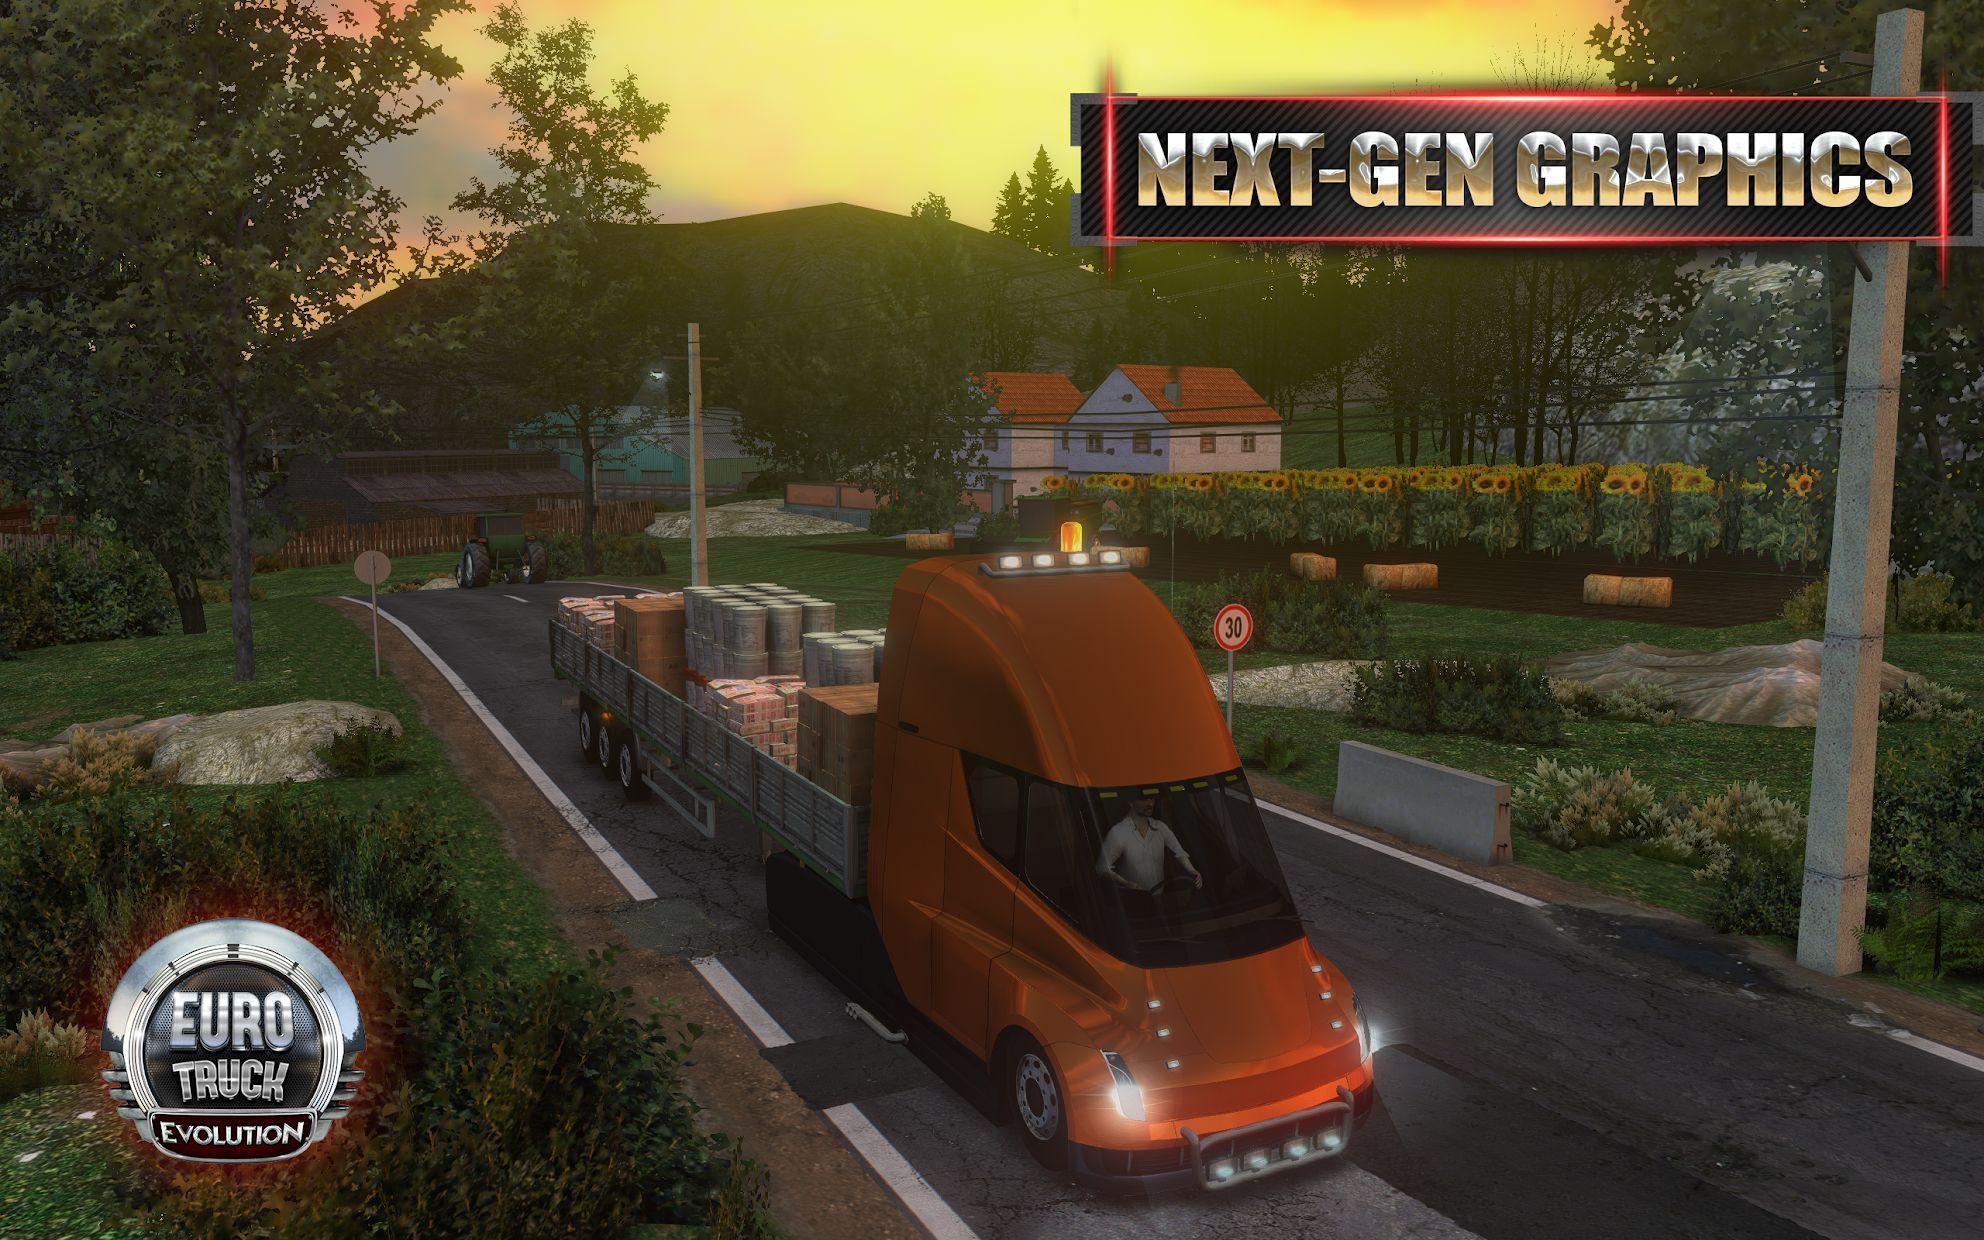 Euro Truck Evolution (Simulator) 游戏截图1